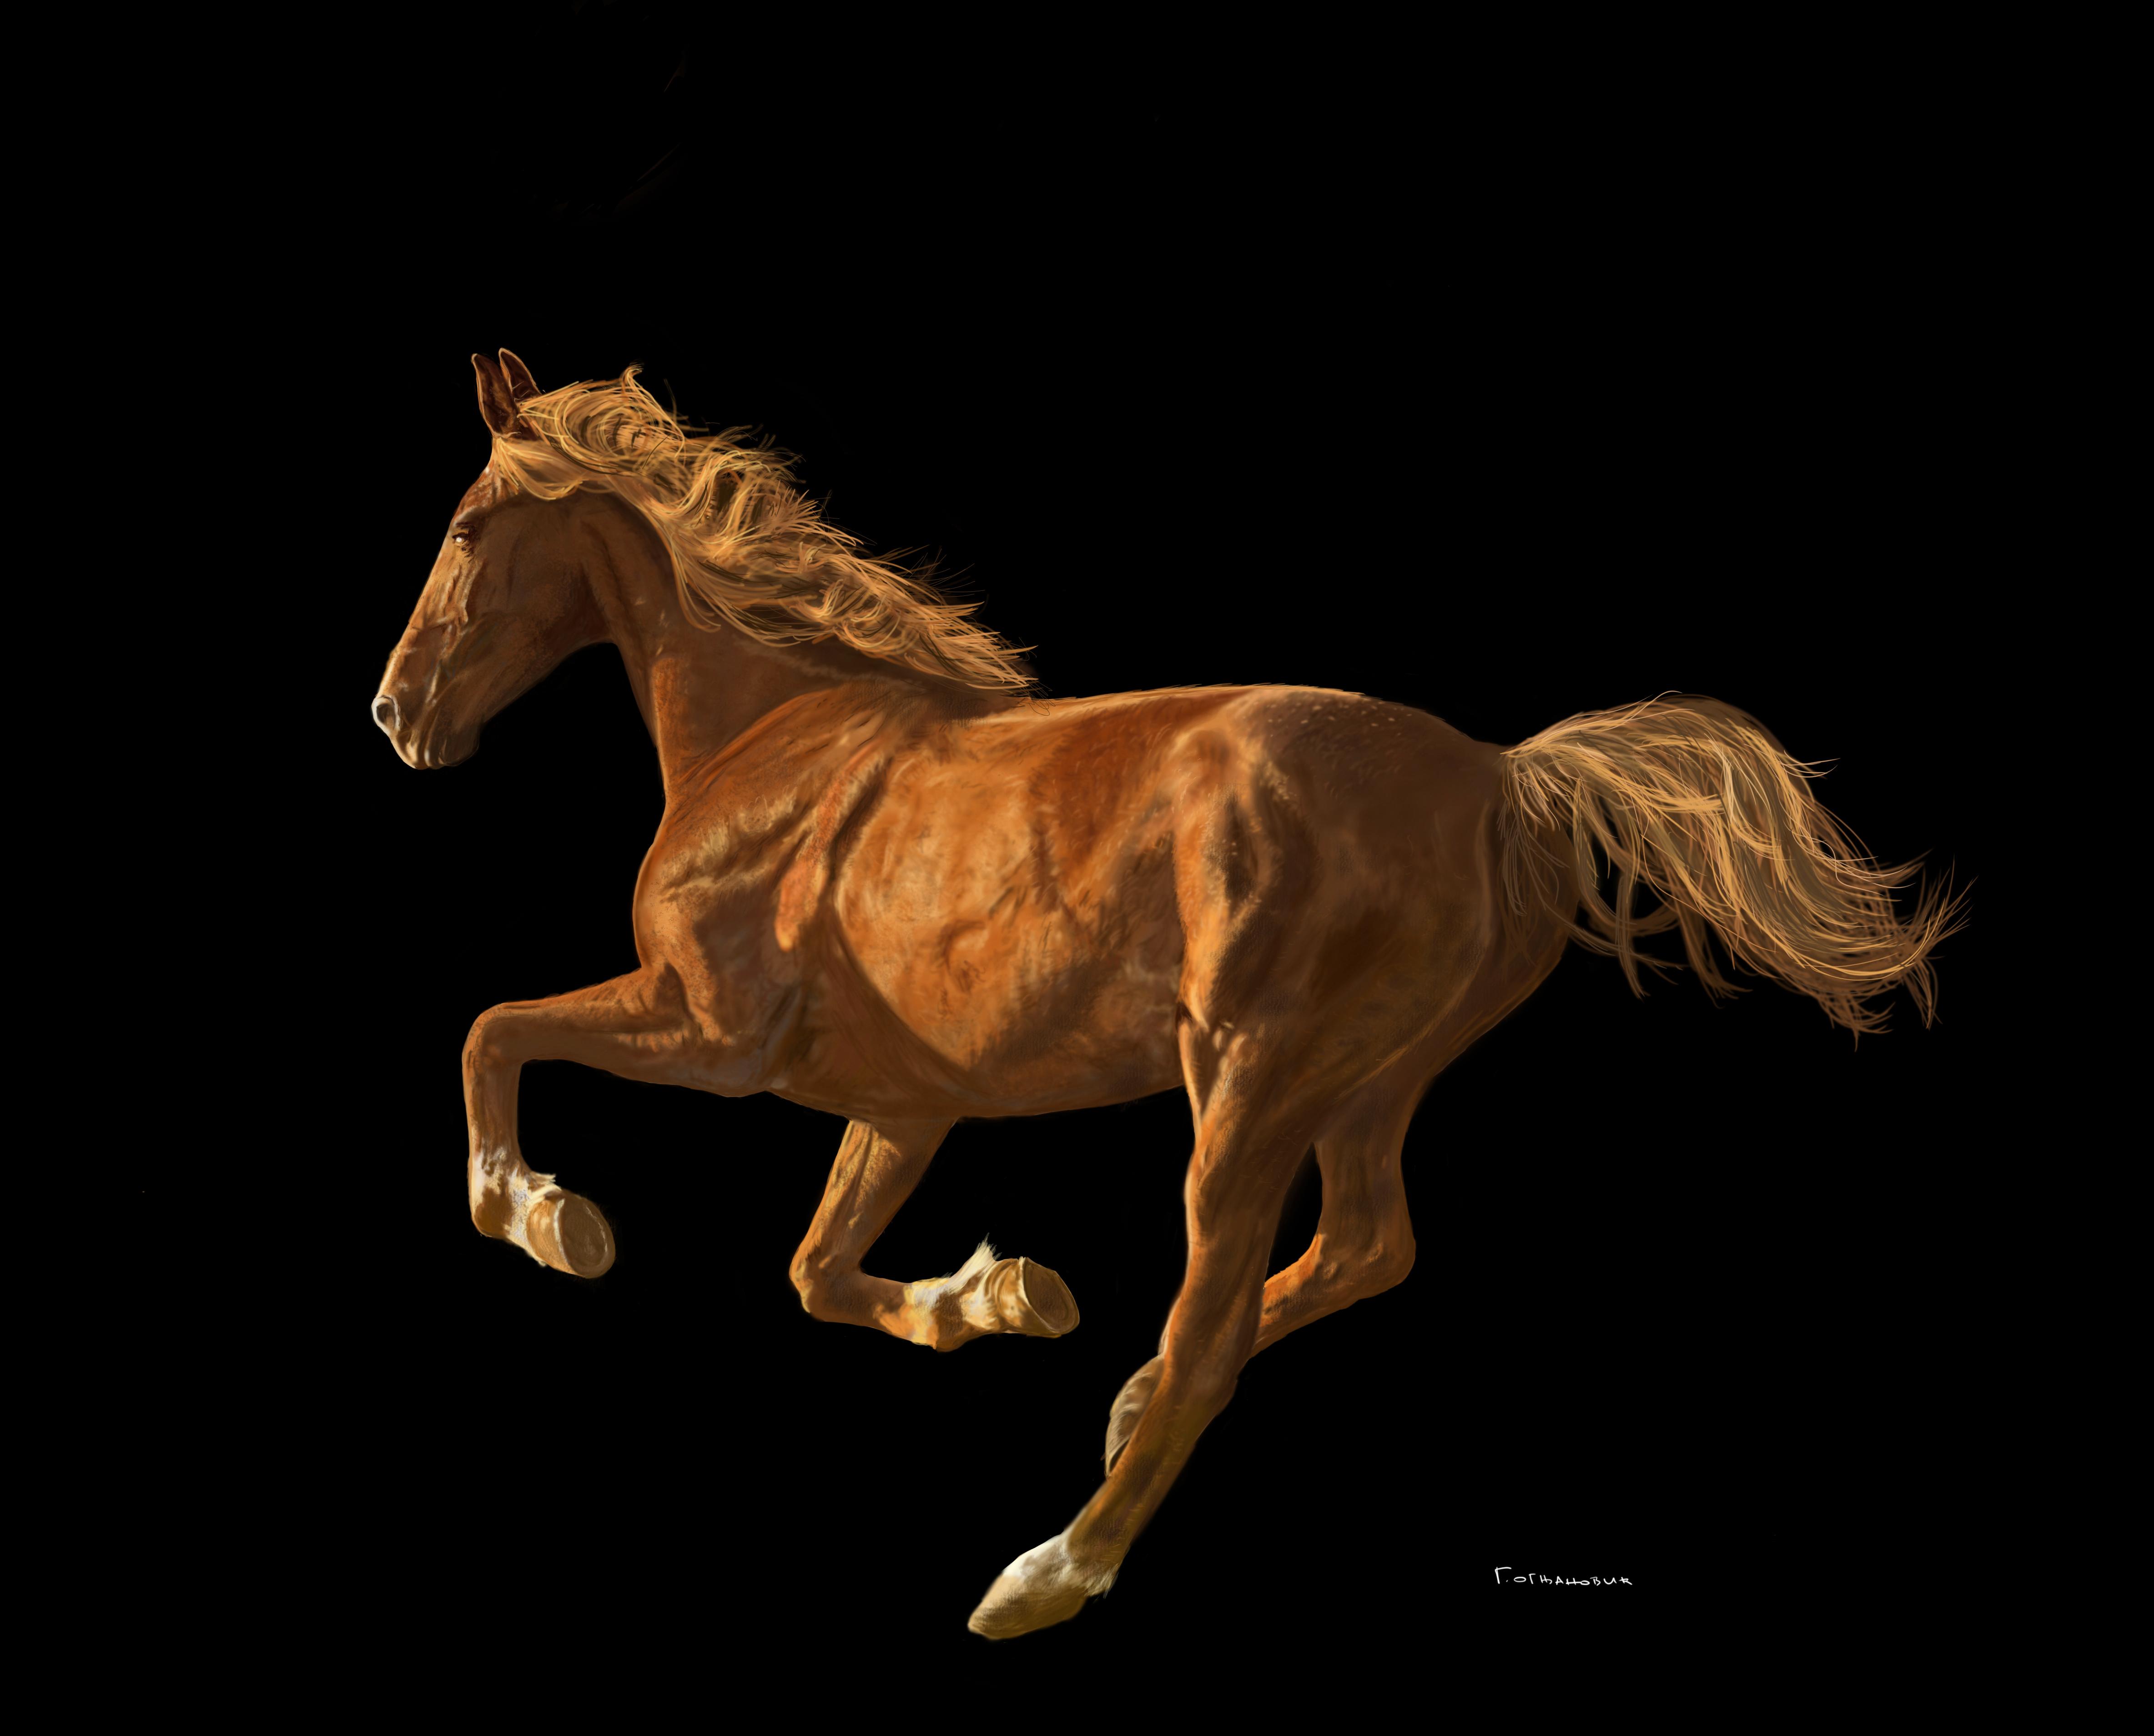 horse_goran_ognjanovic.jpg